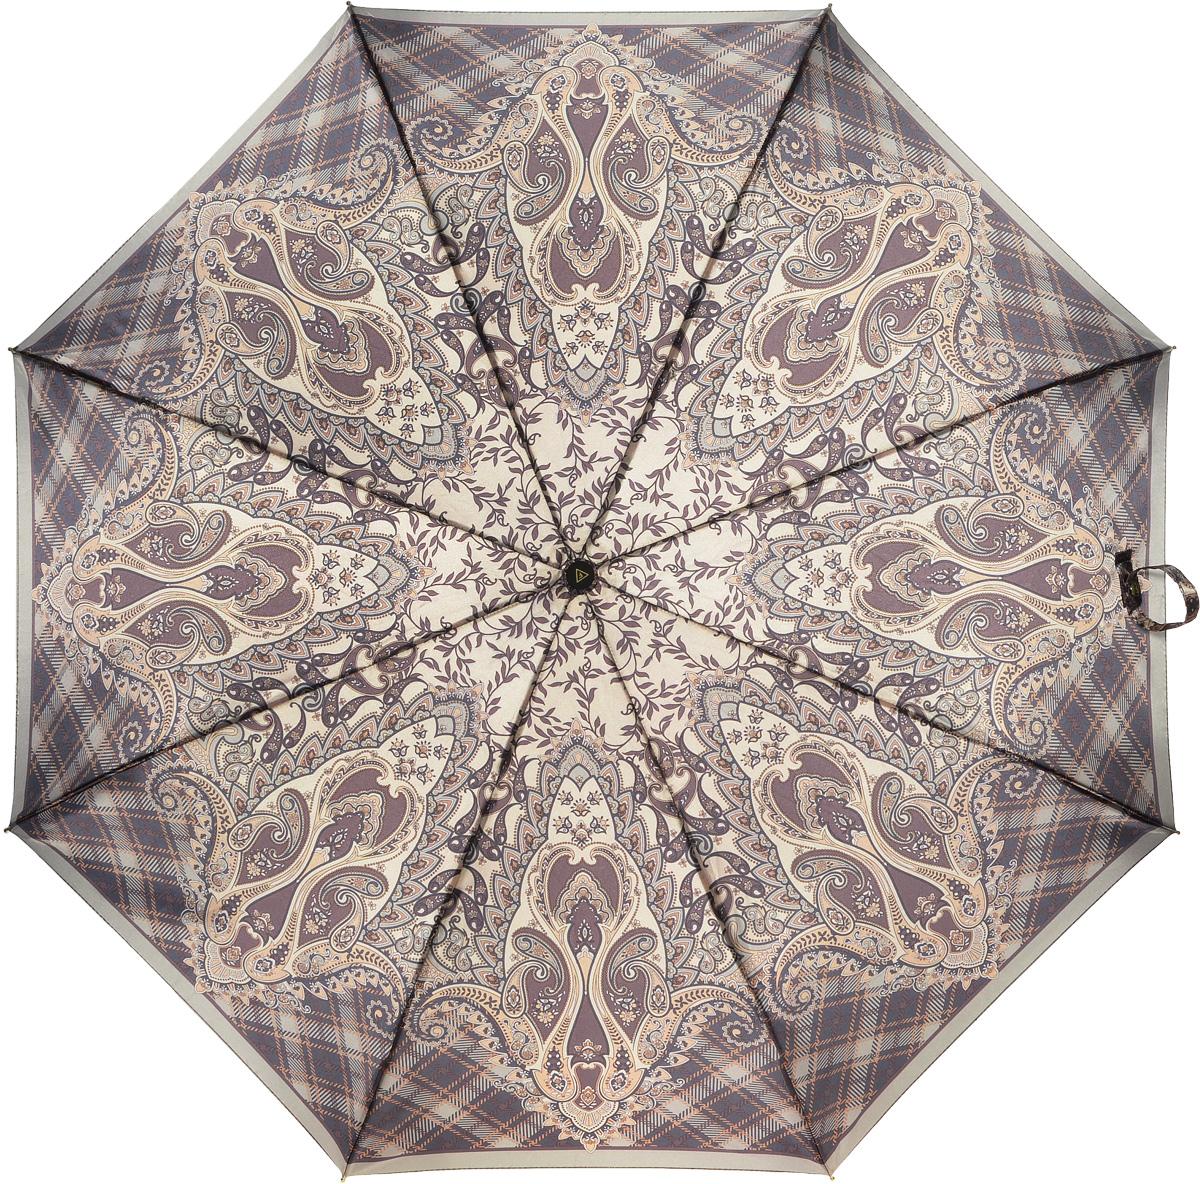 Зонт женский Fabretti, автомат, 3 сложения. L-16107-27L-16107-27Зонт женский Fabretti, облегченный суперавтомат, 3 сложения